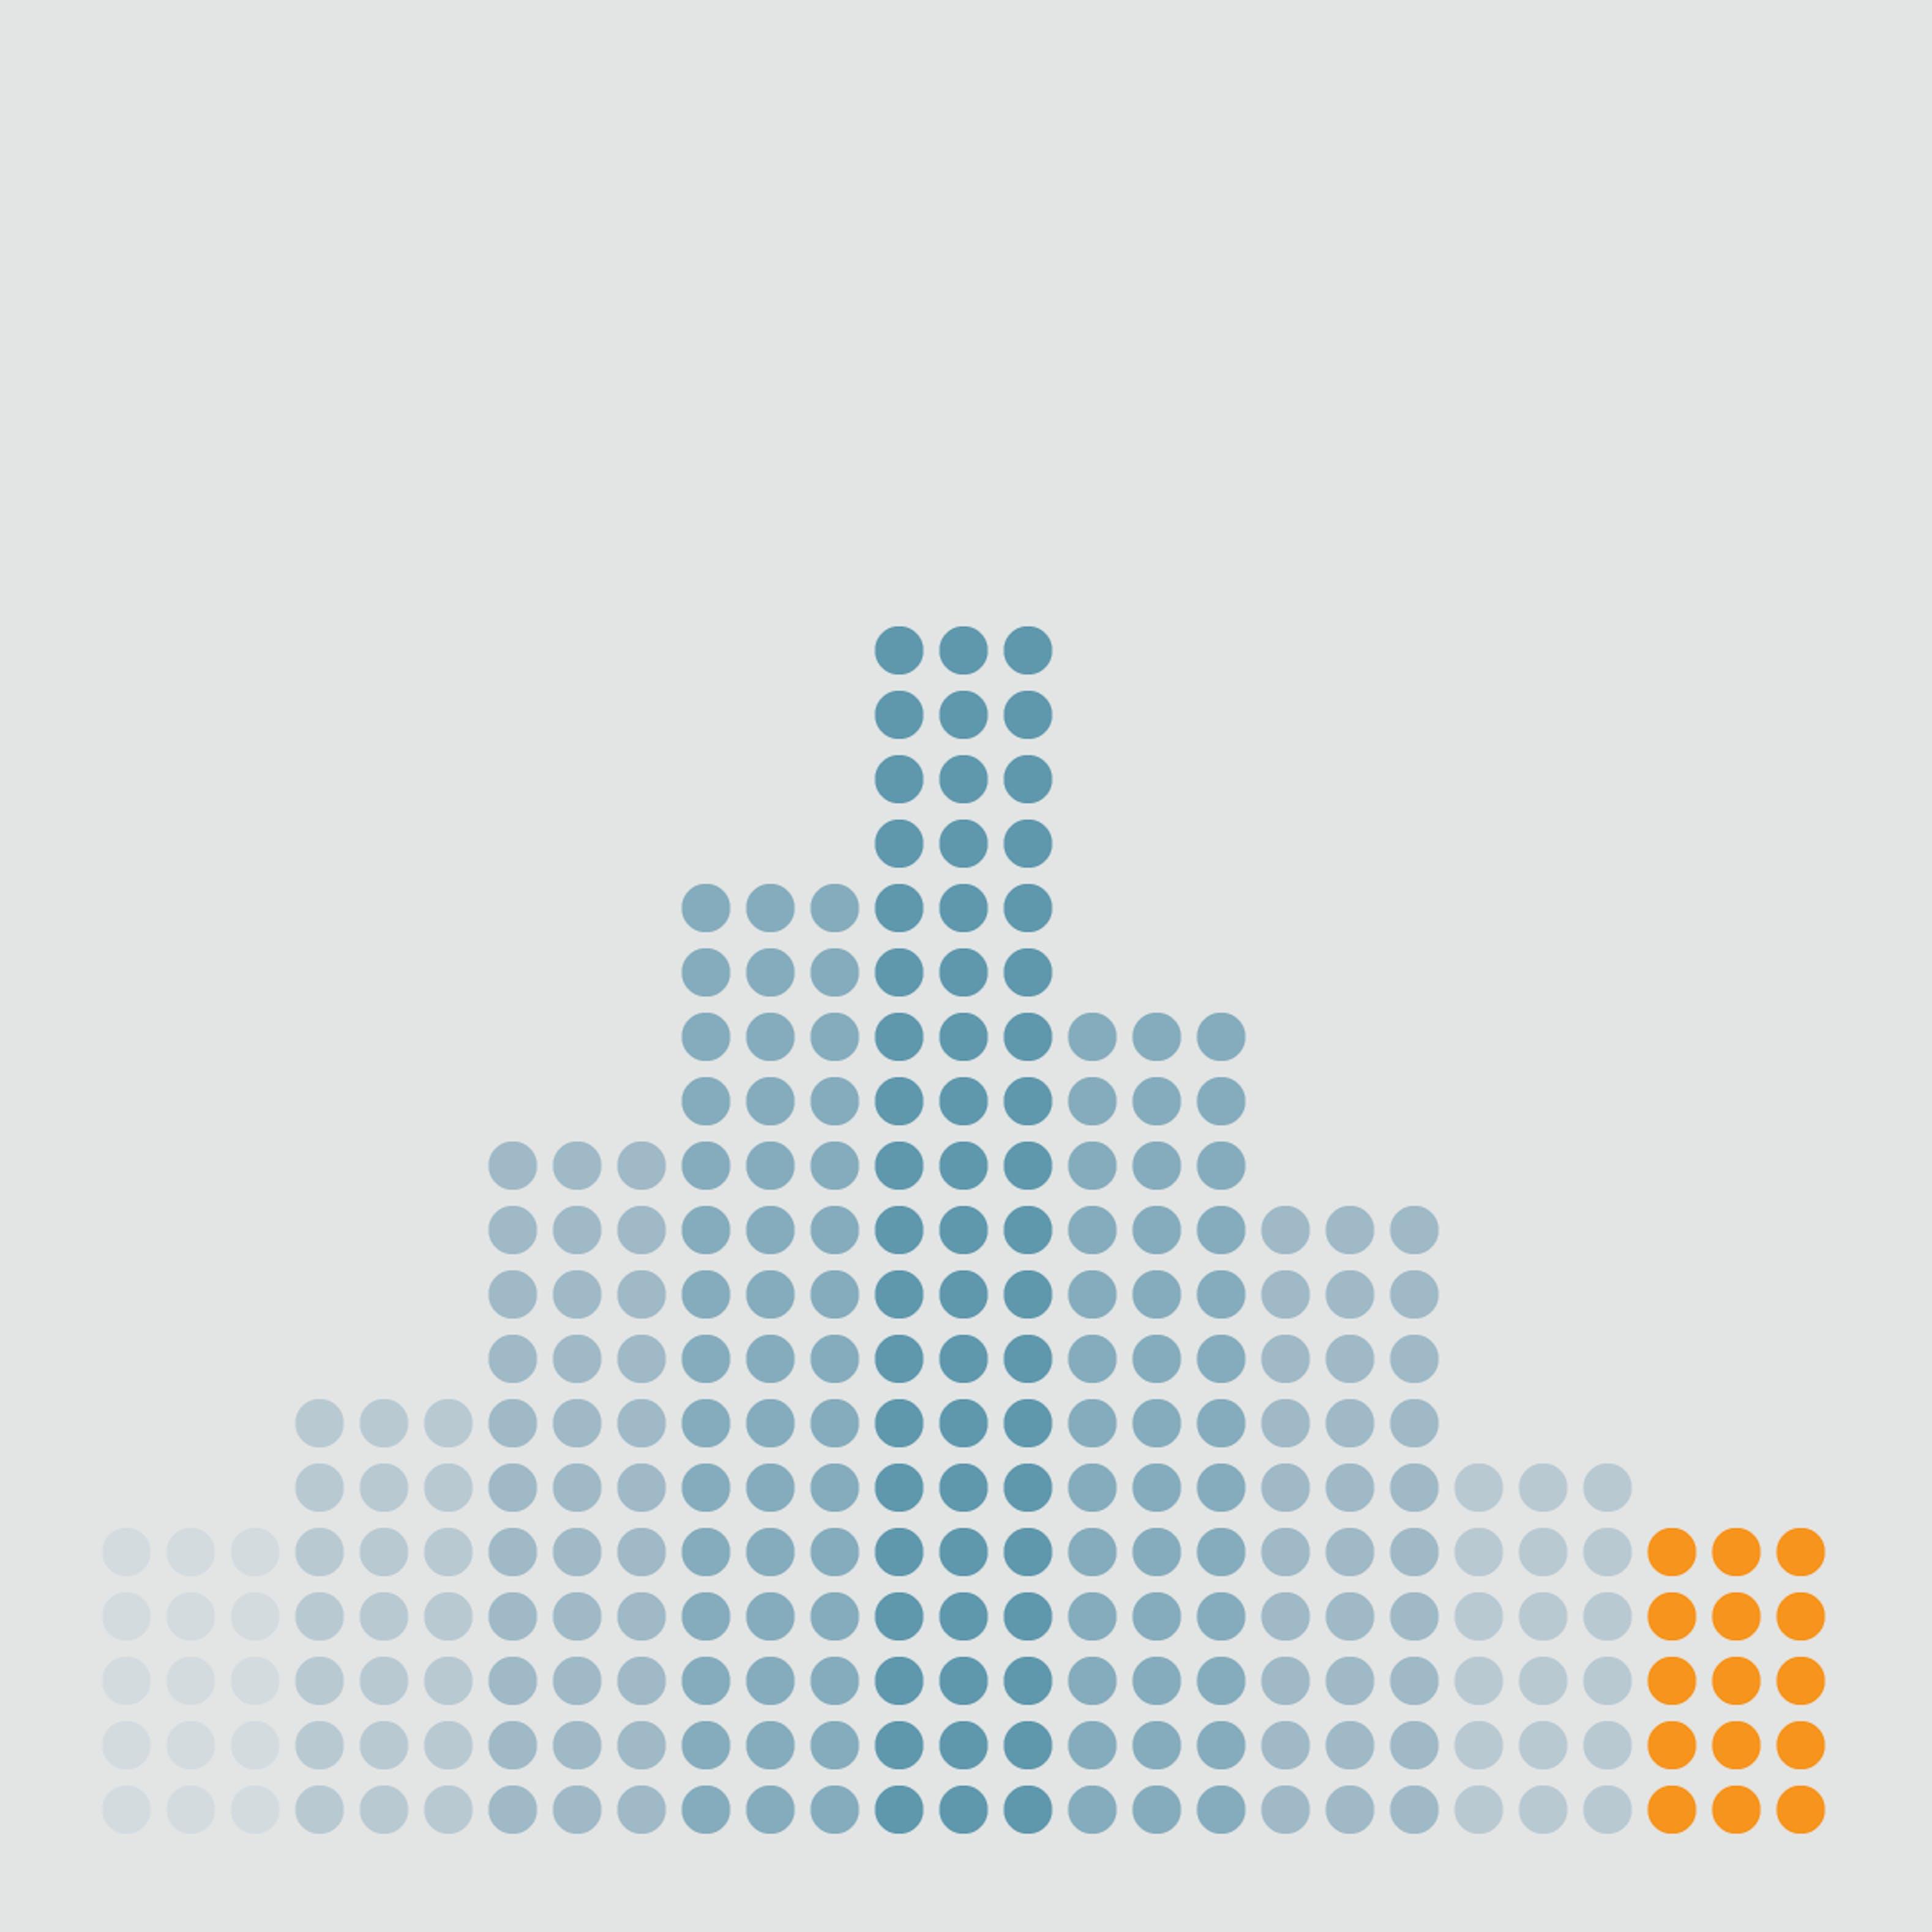 Inferential Statistics | Coursera